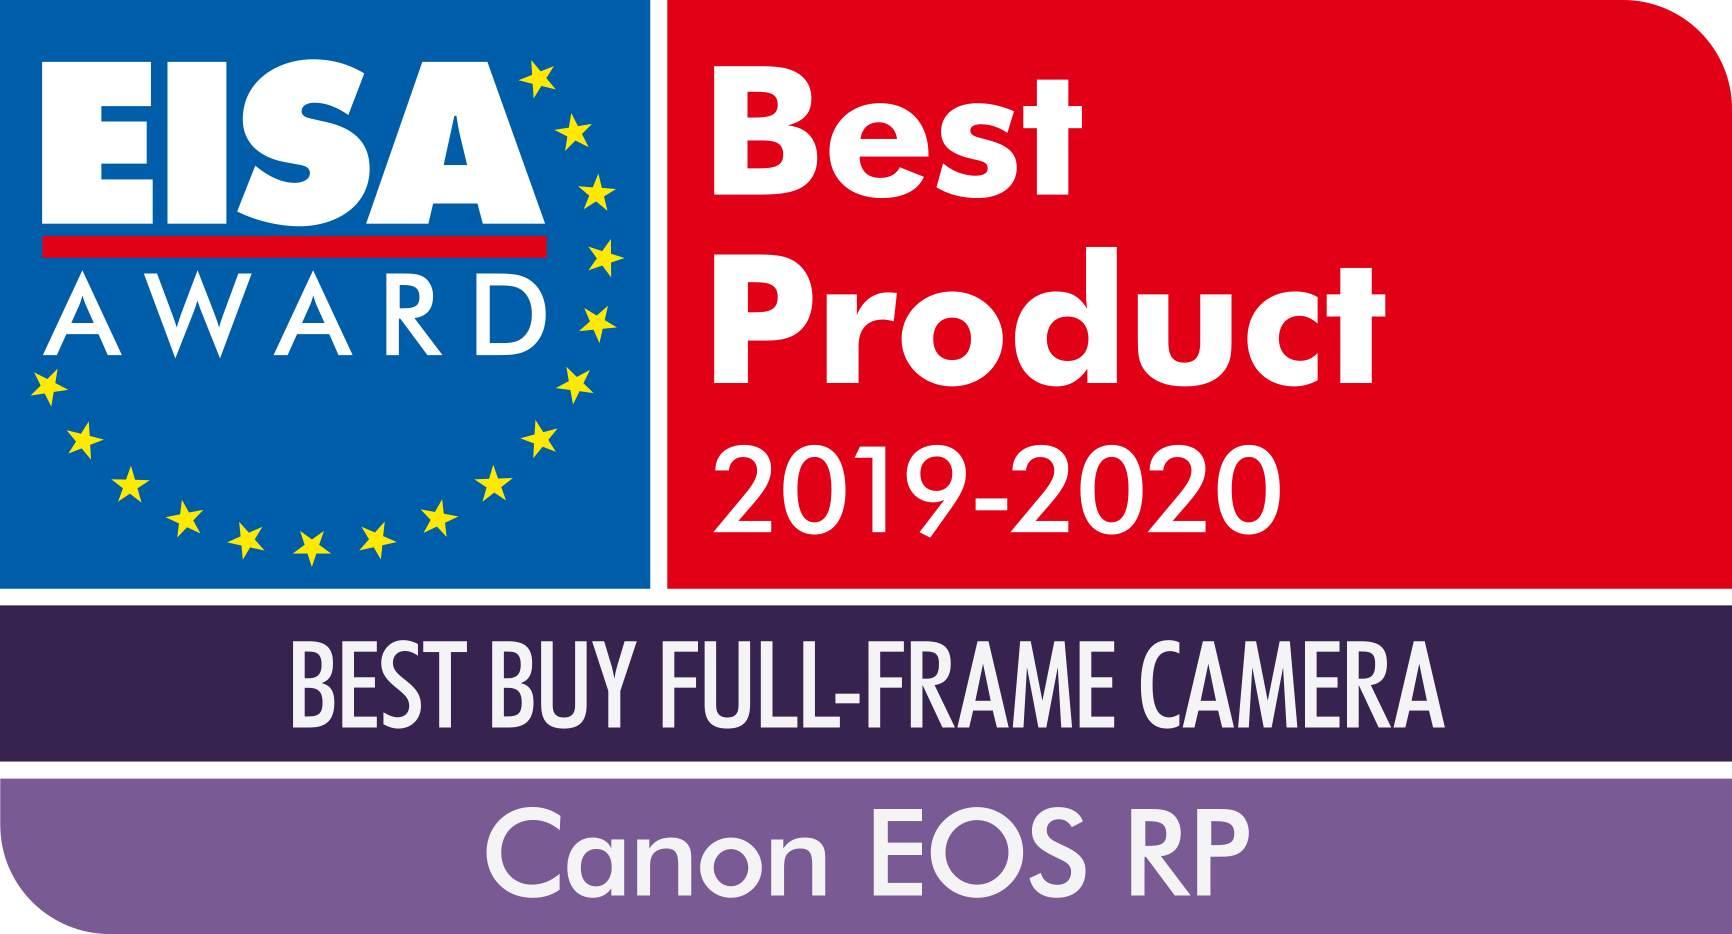 EISA Award Canon EOS RP - JPEG.jpg